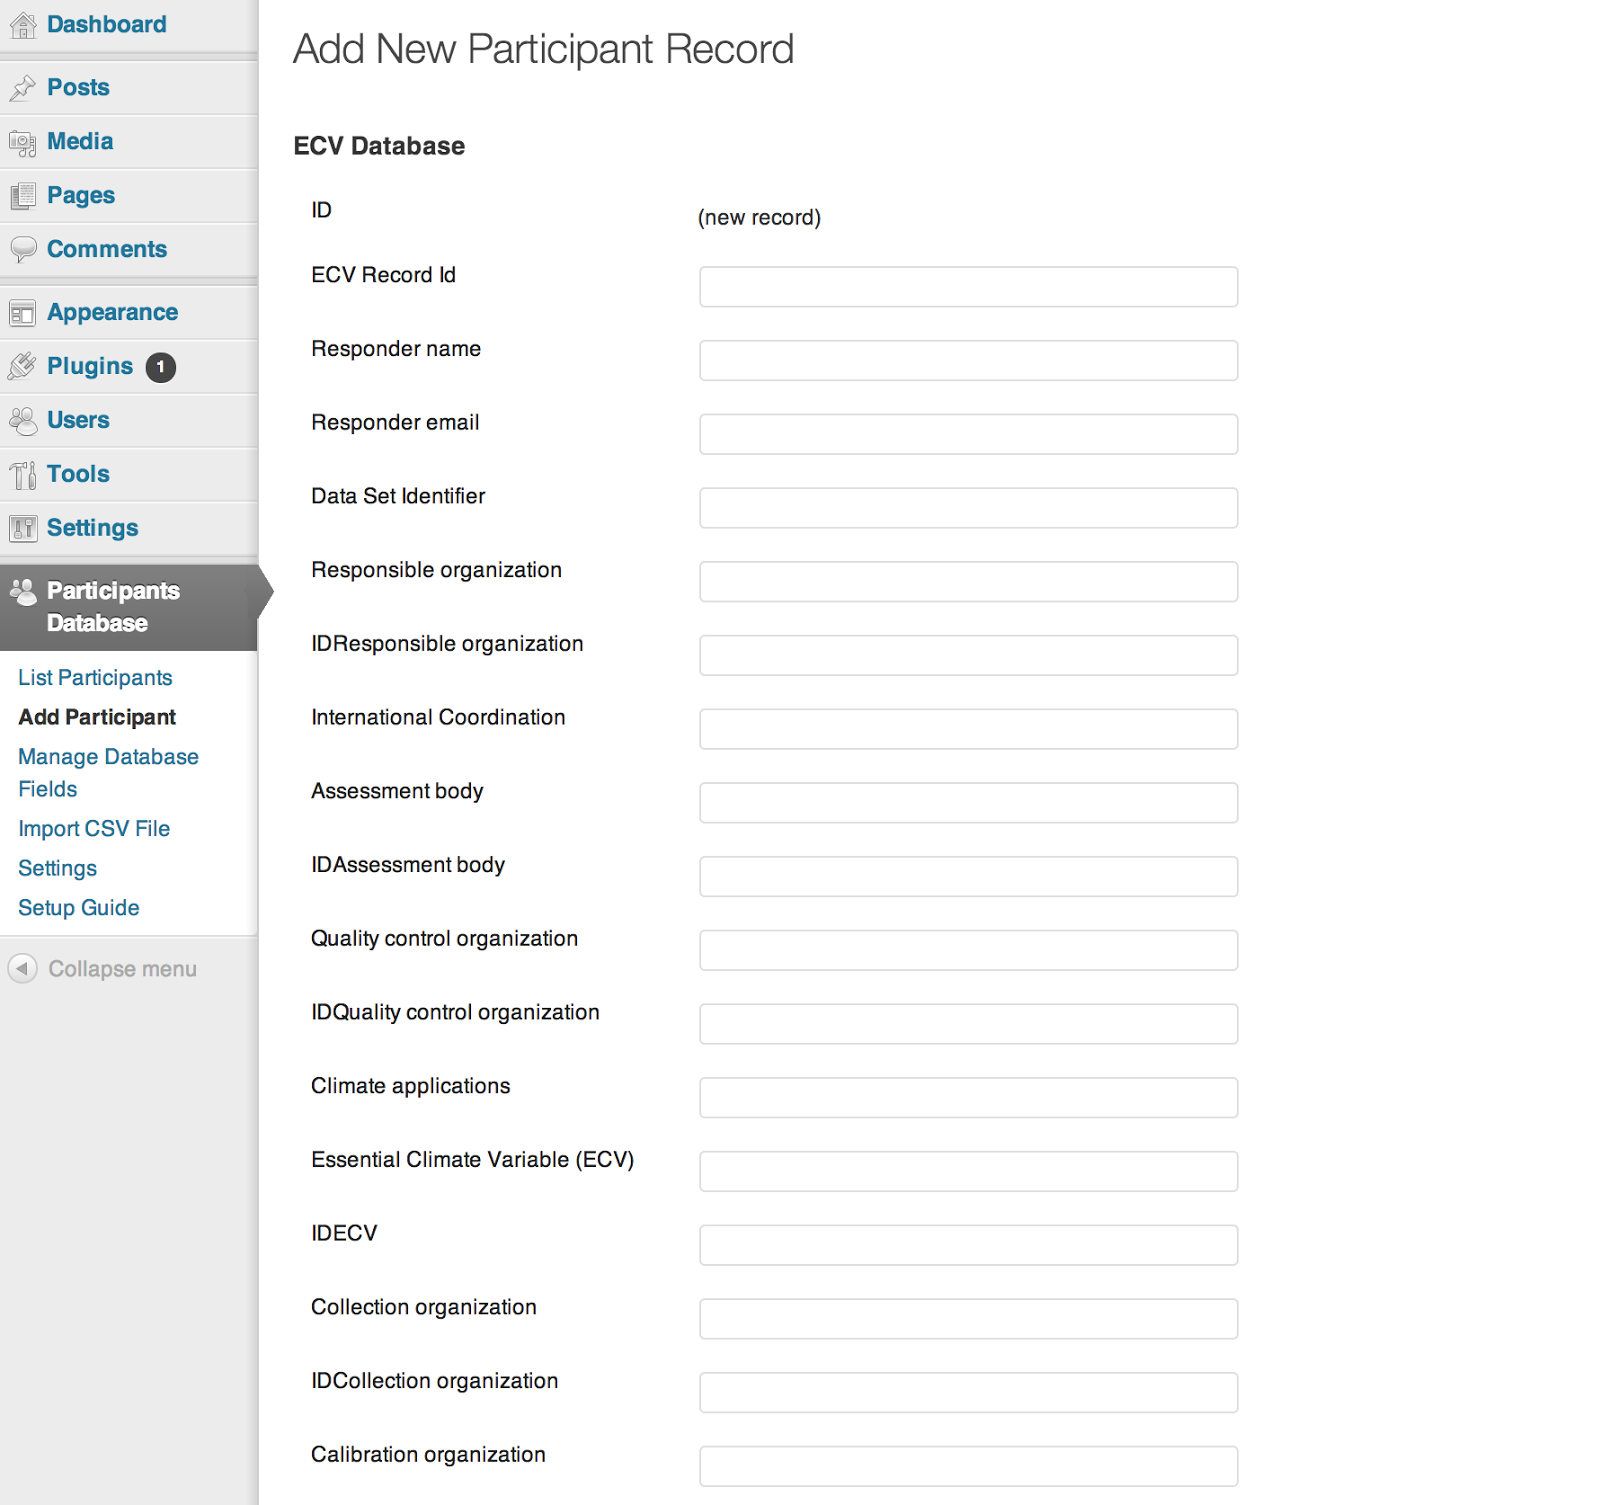 Participants Database Wordpress Participants Database 1.5.4.8 - SQL Injection